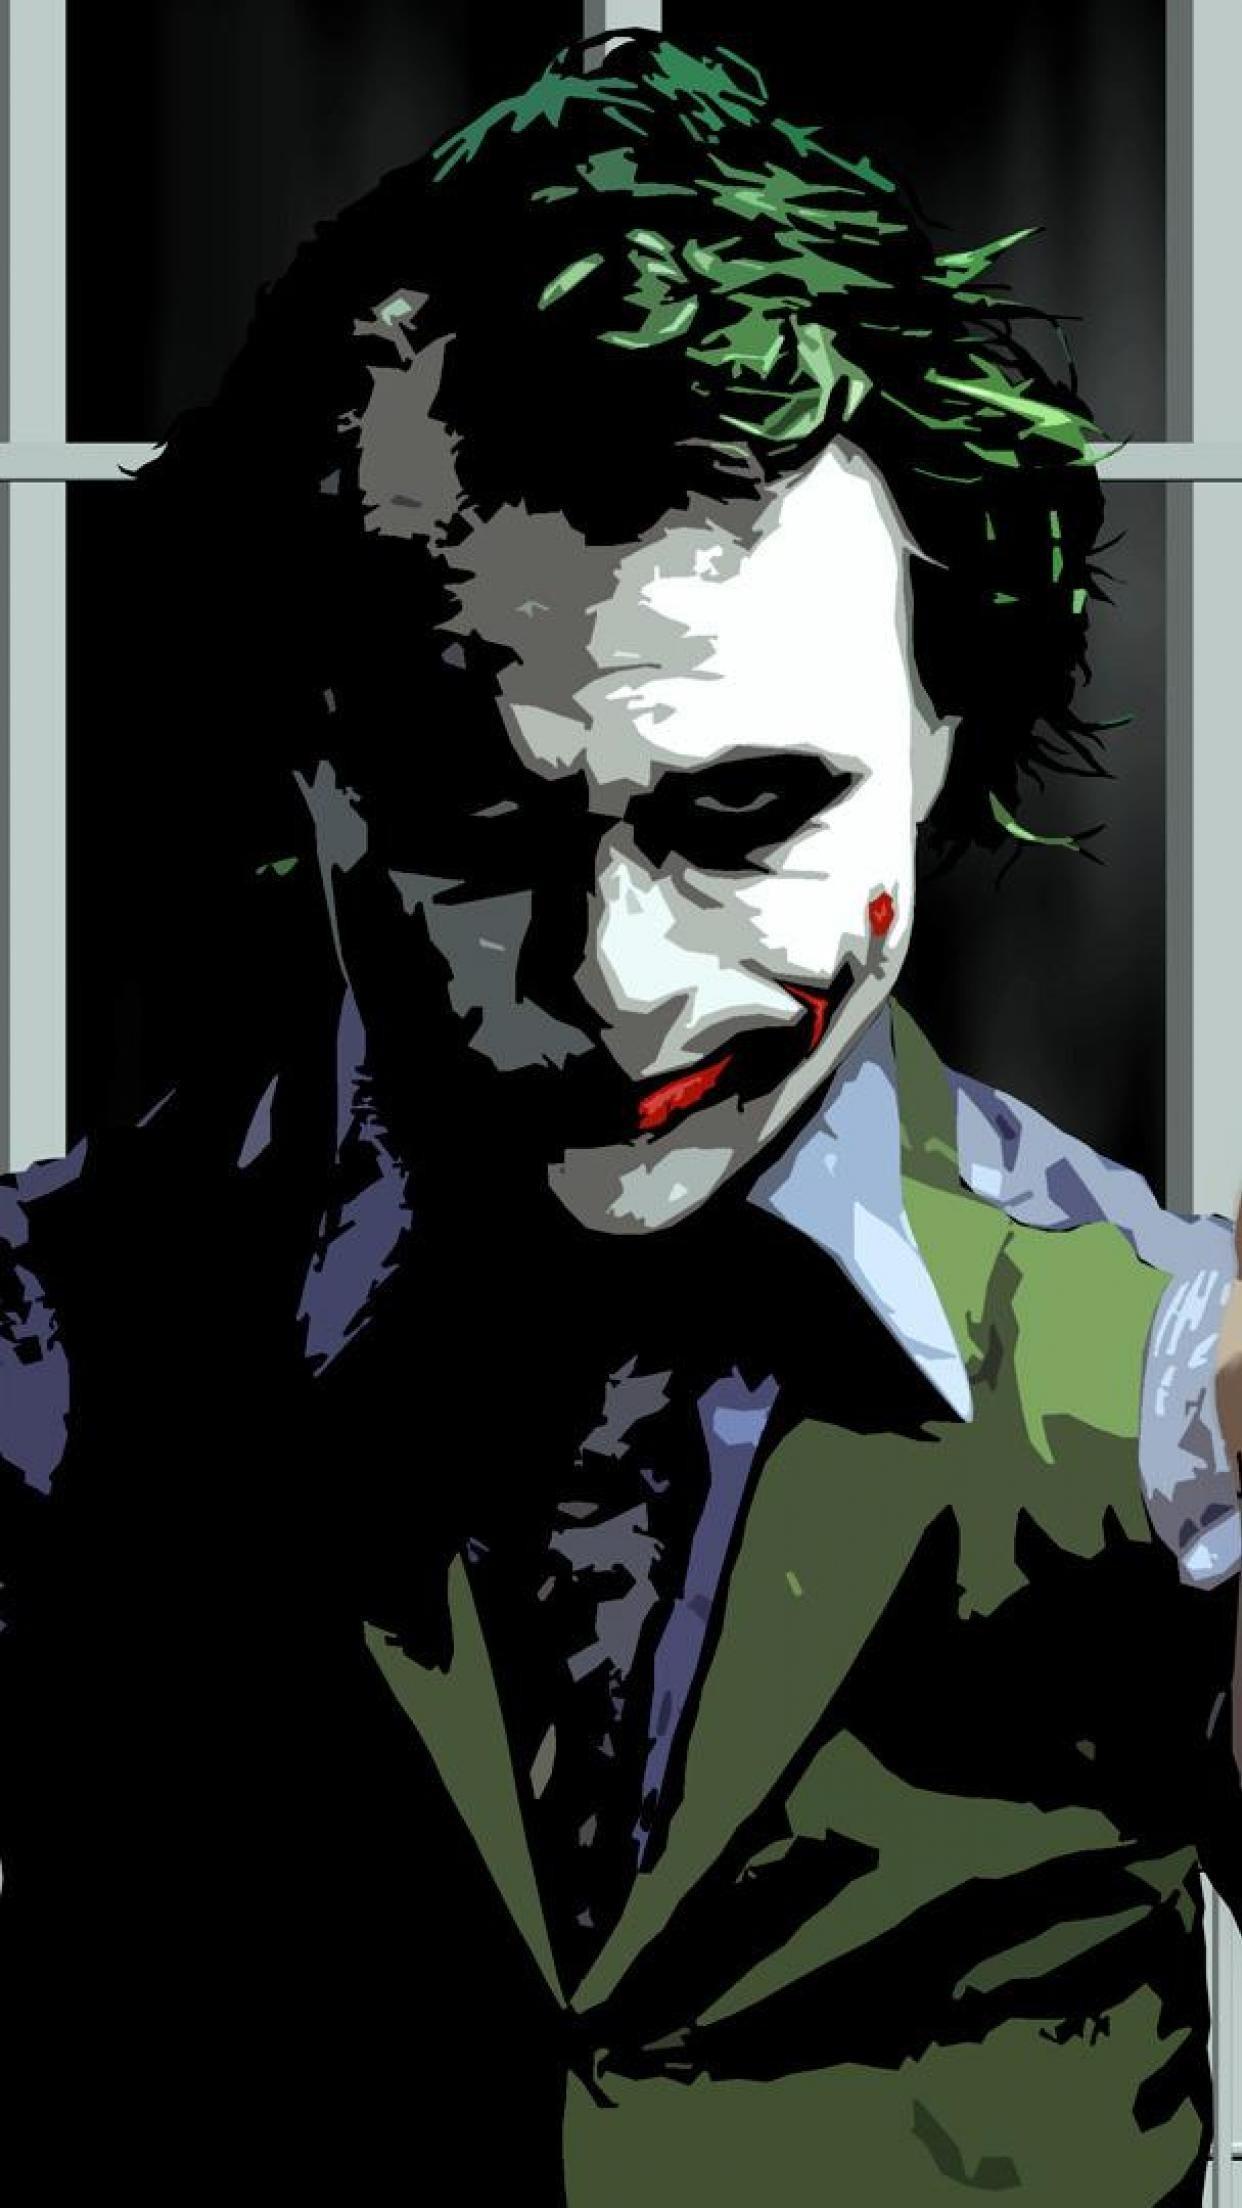 Hd Iphone Joker Wallpaper 75 Images